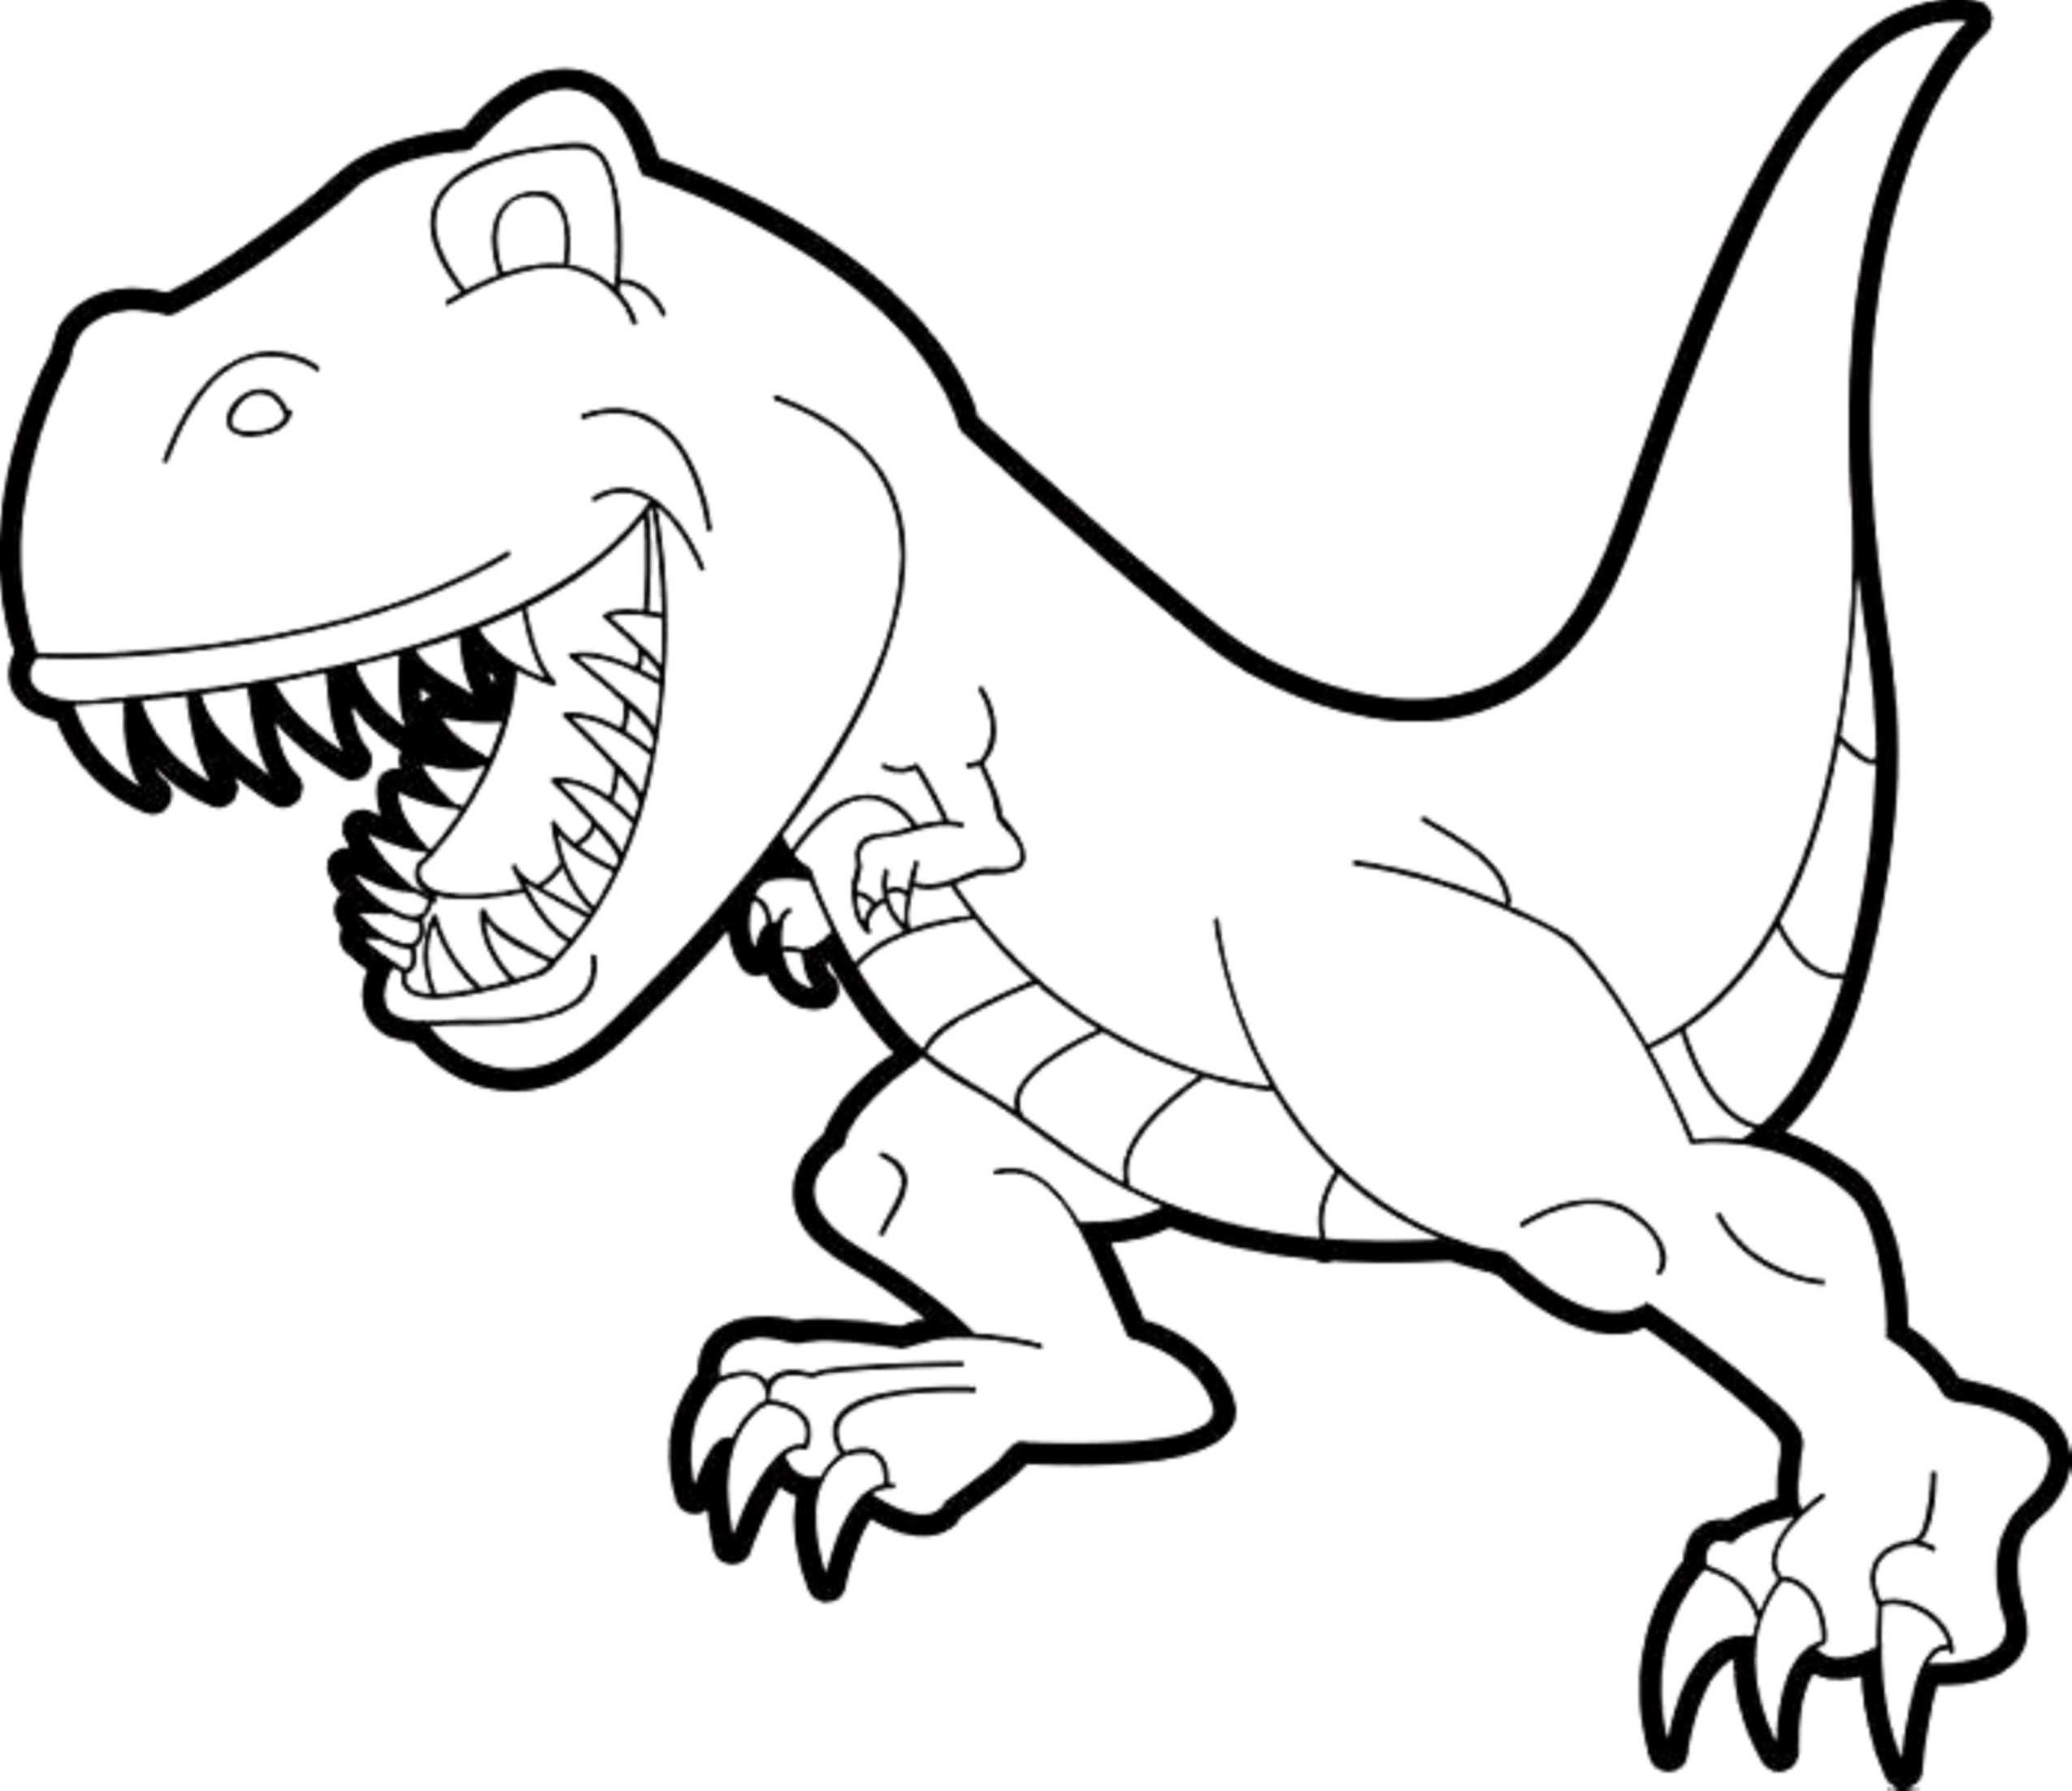 tyrannosaurus rex coloring page # 1